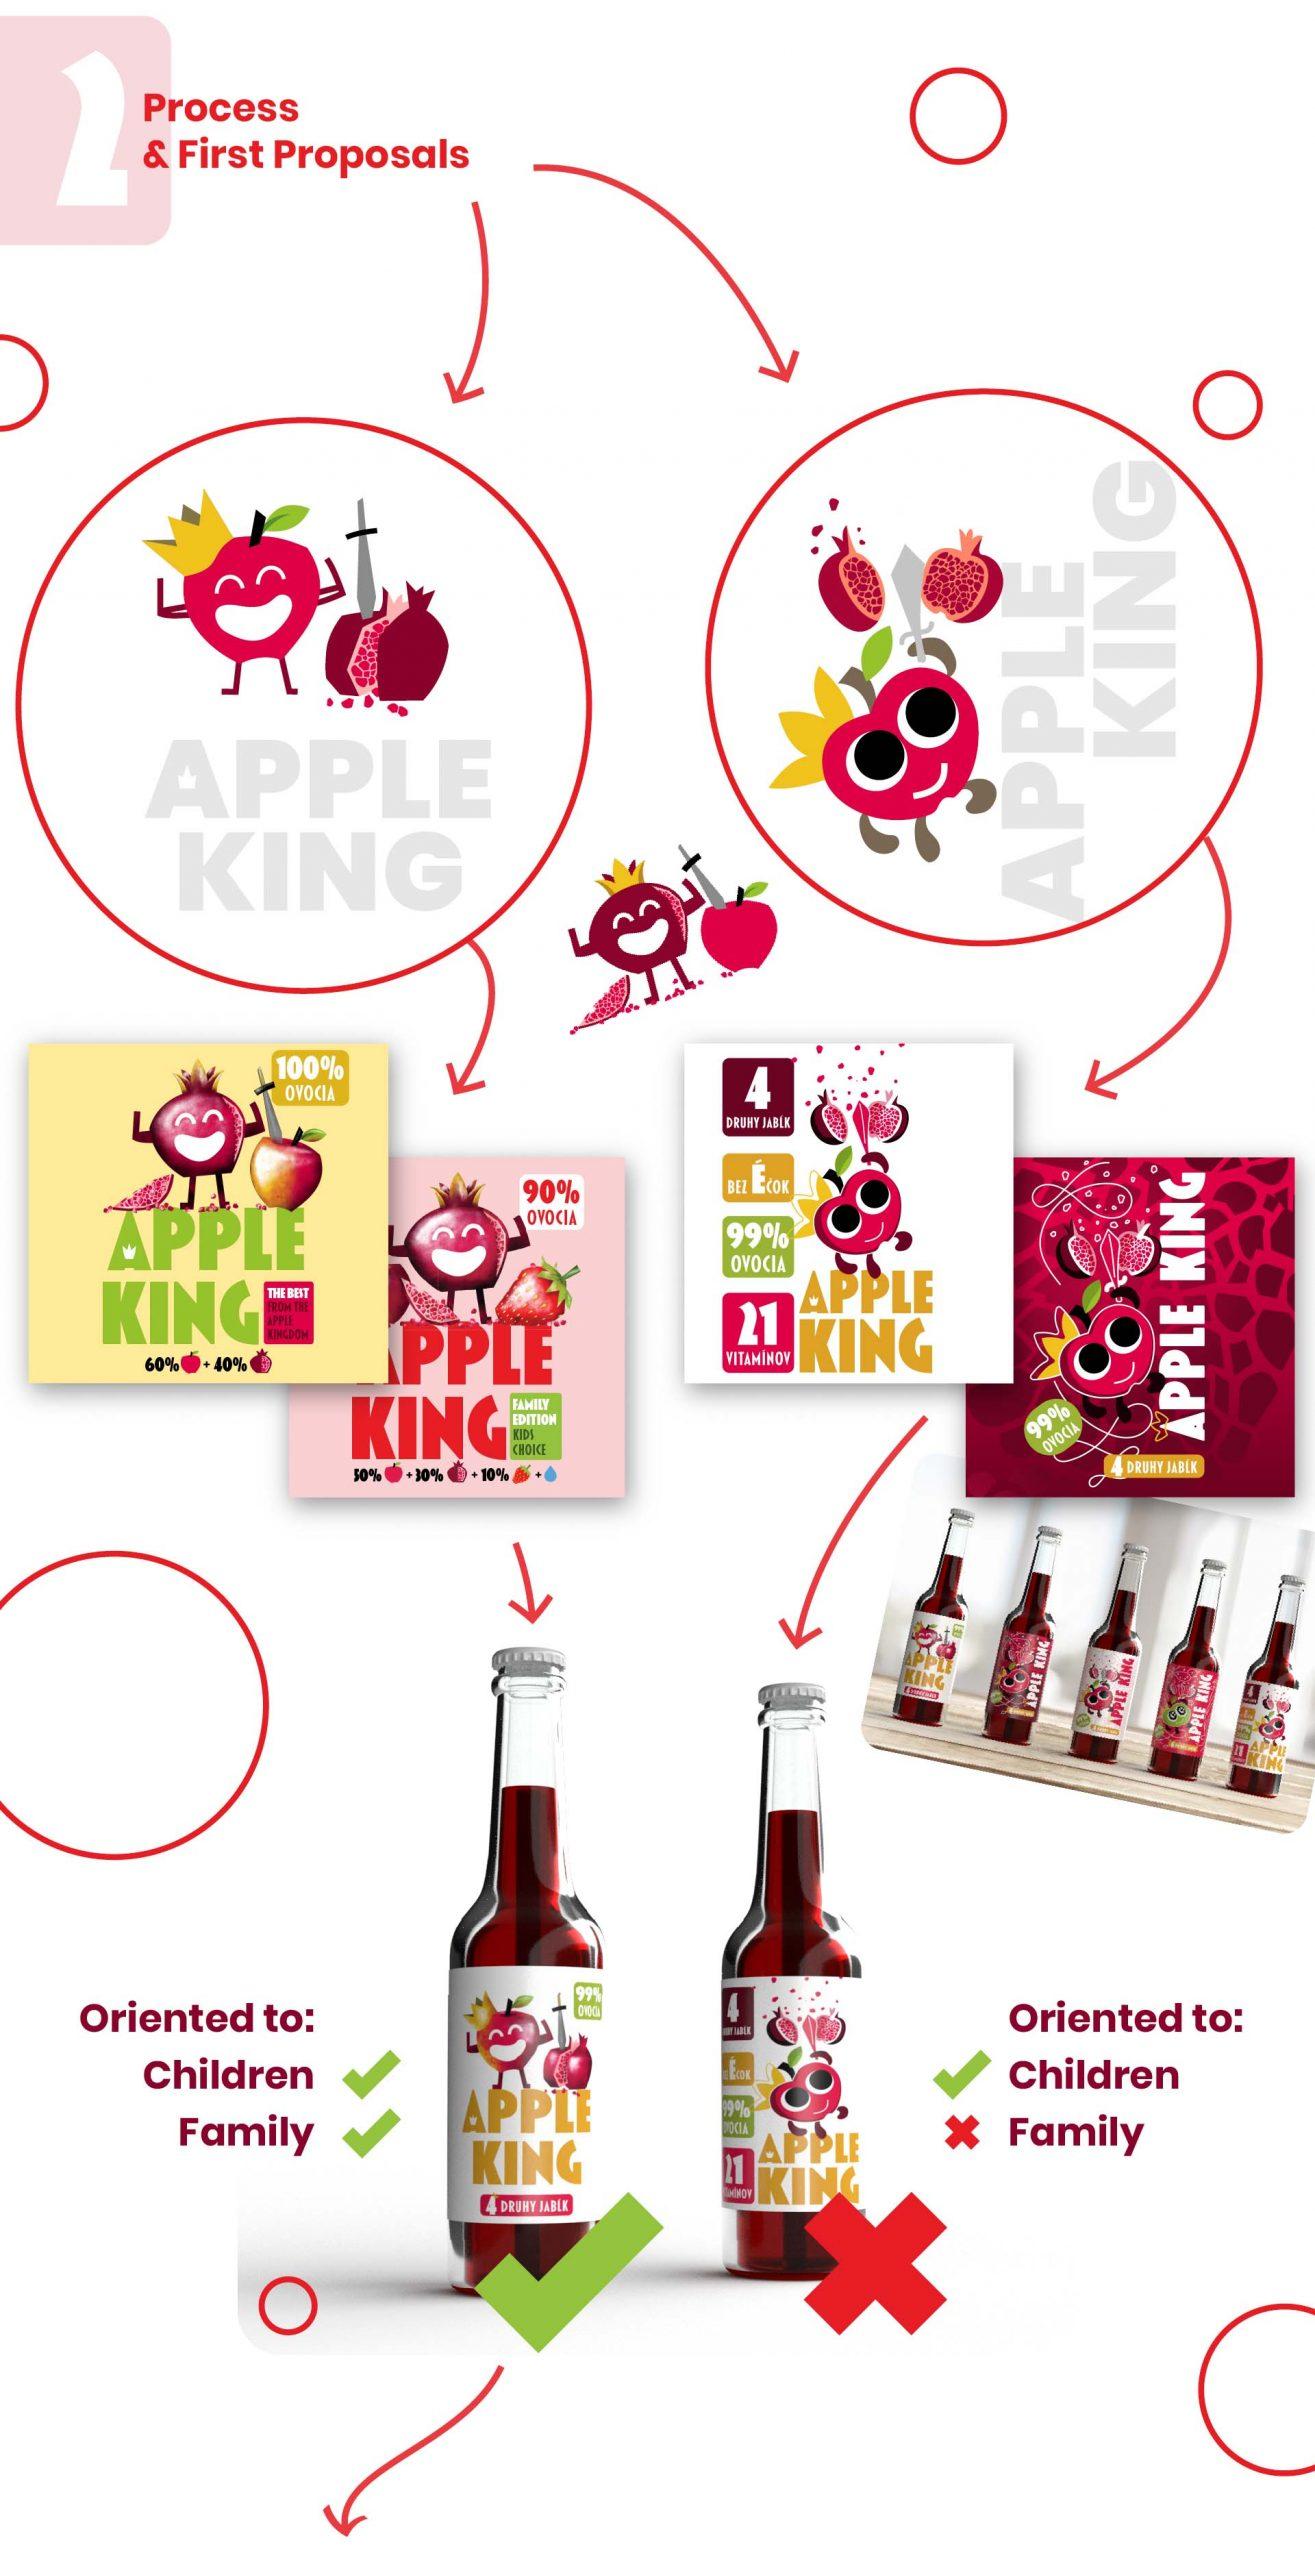 Koncepty k dizajnu apple king šťavy